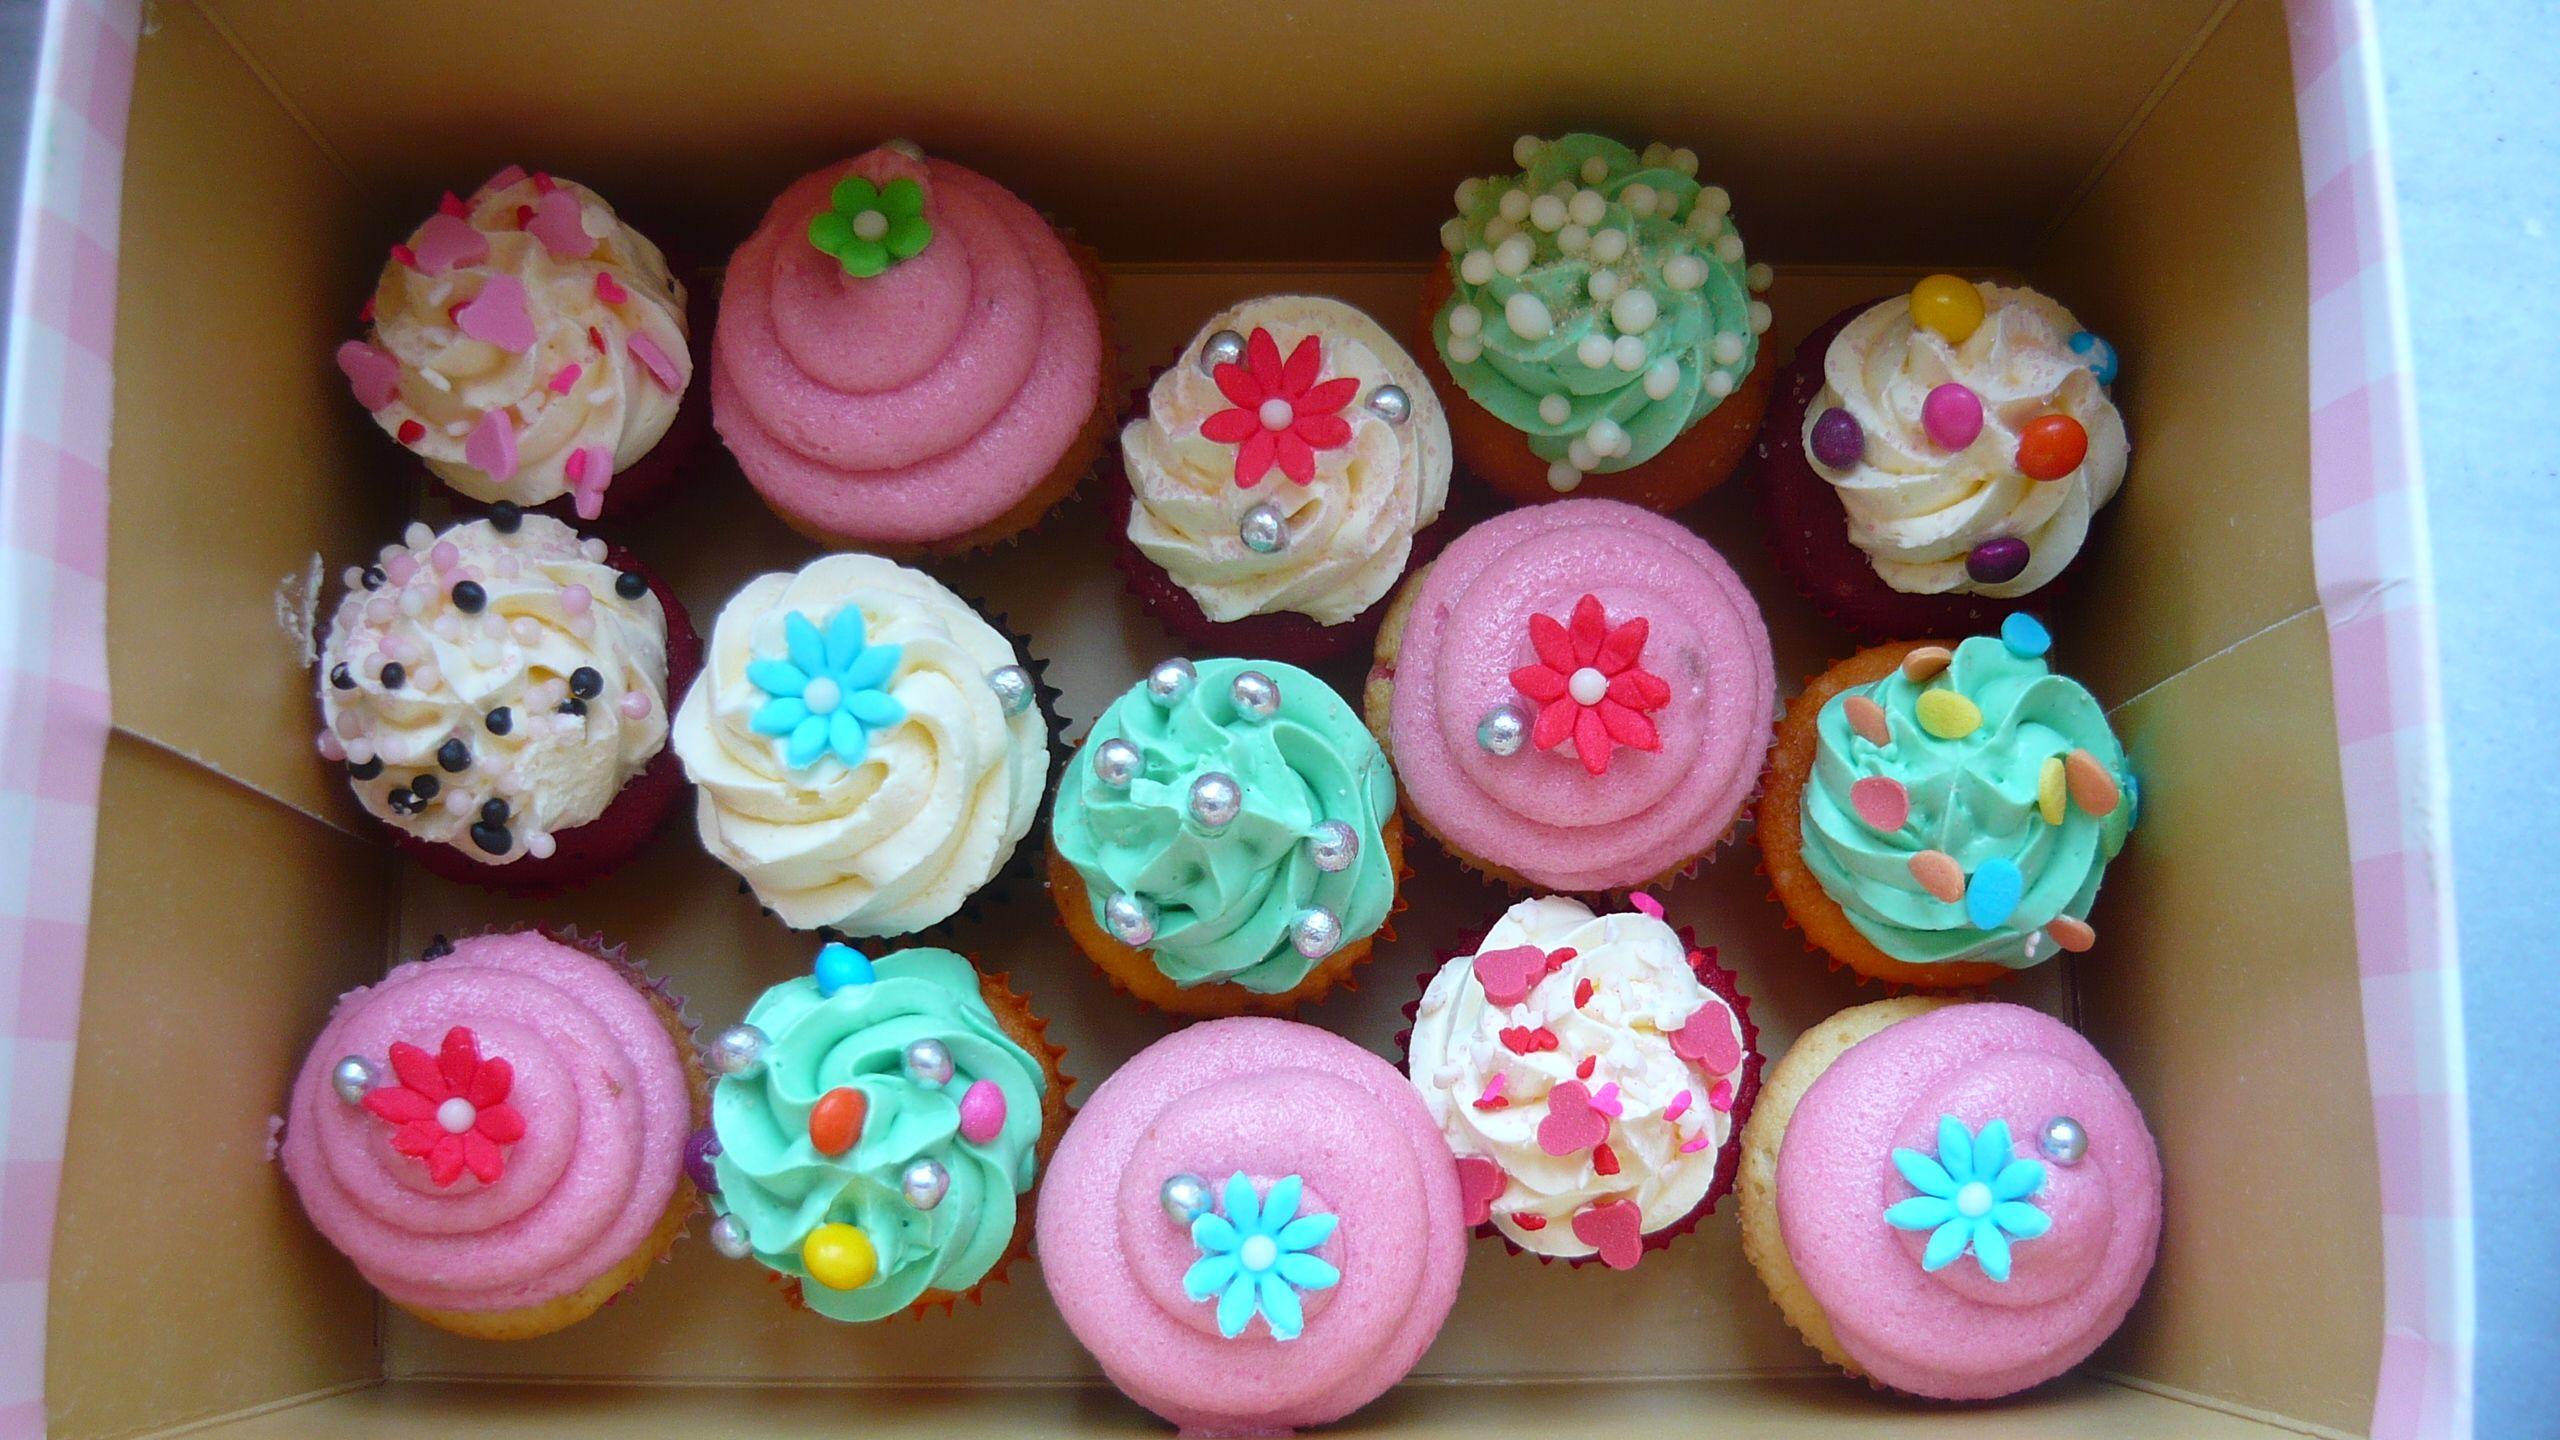 Easy Cake Decoating Ideas For Kids